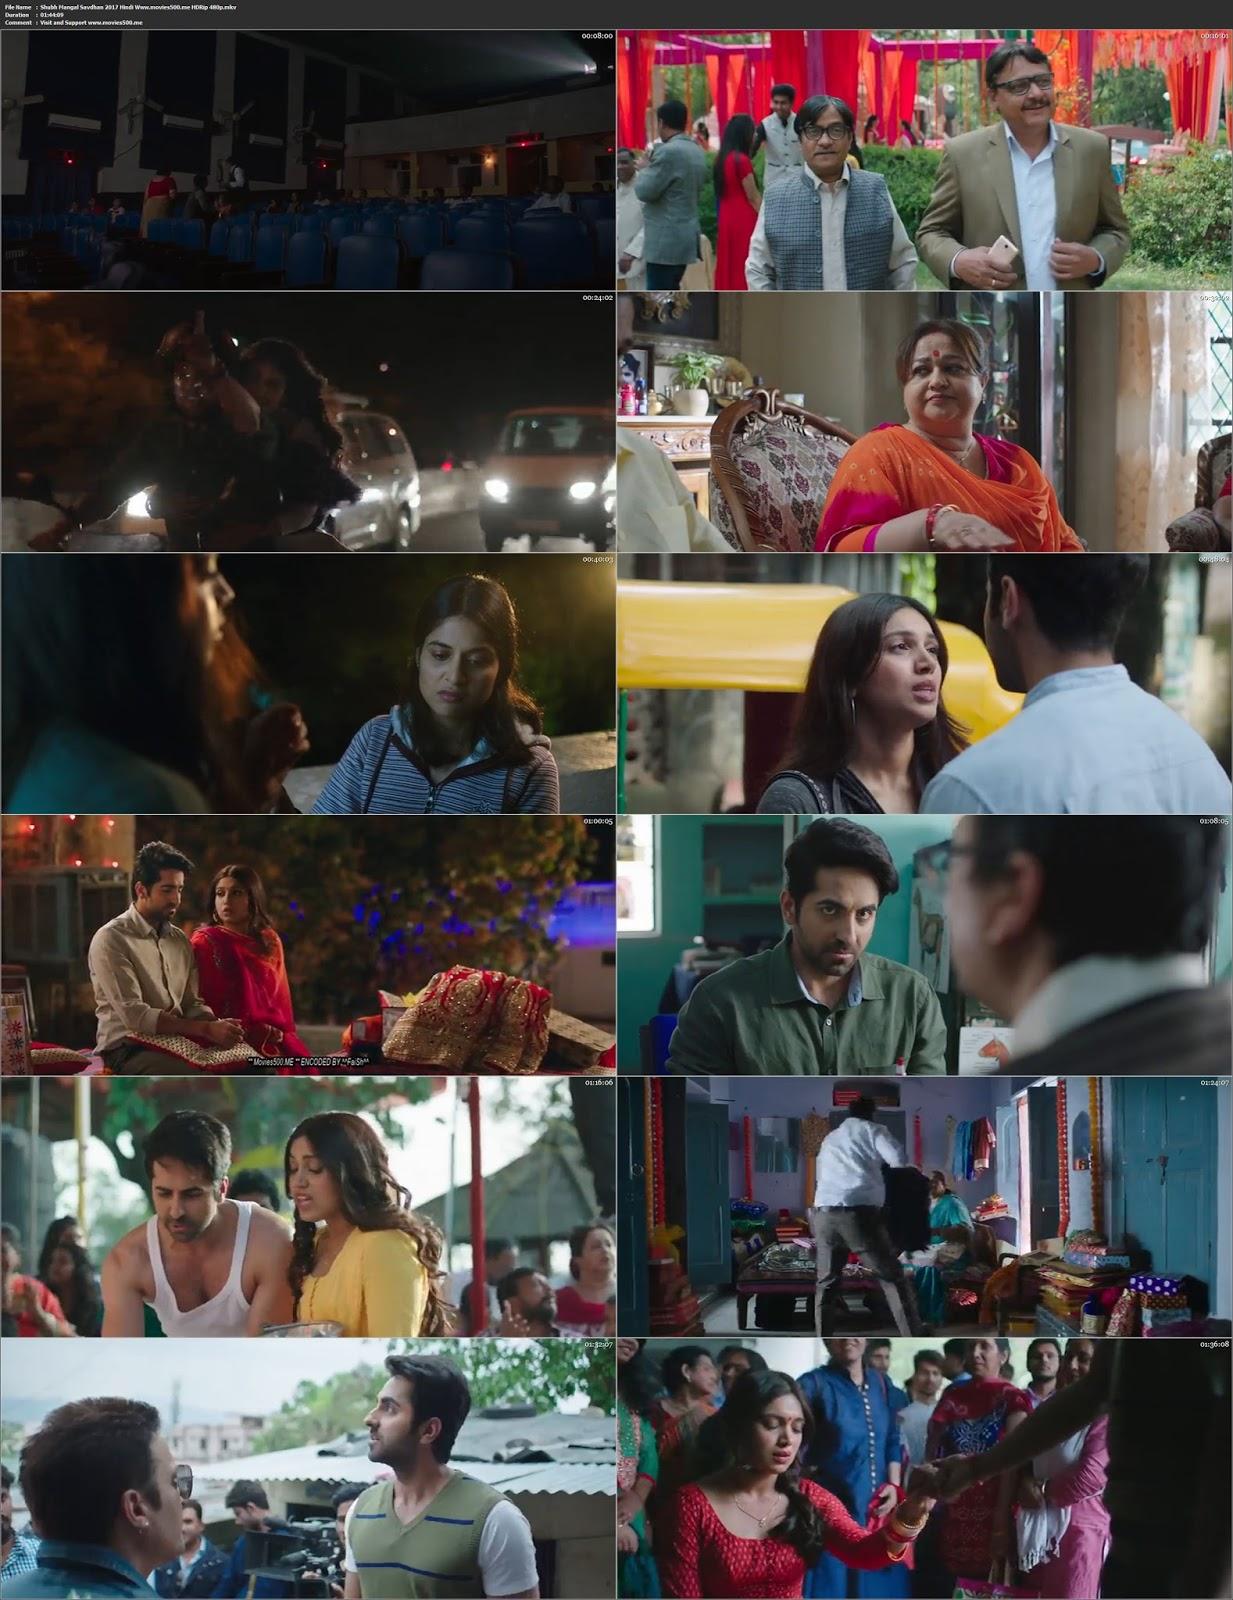 Shubh Mangal Saavdhan 2017 Bollywood 300MB HDRip 720p at newbtcbank.com